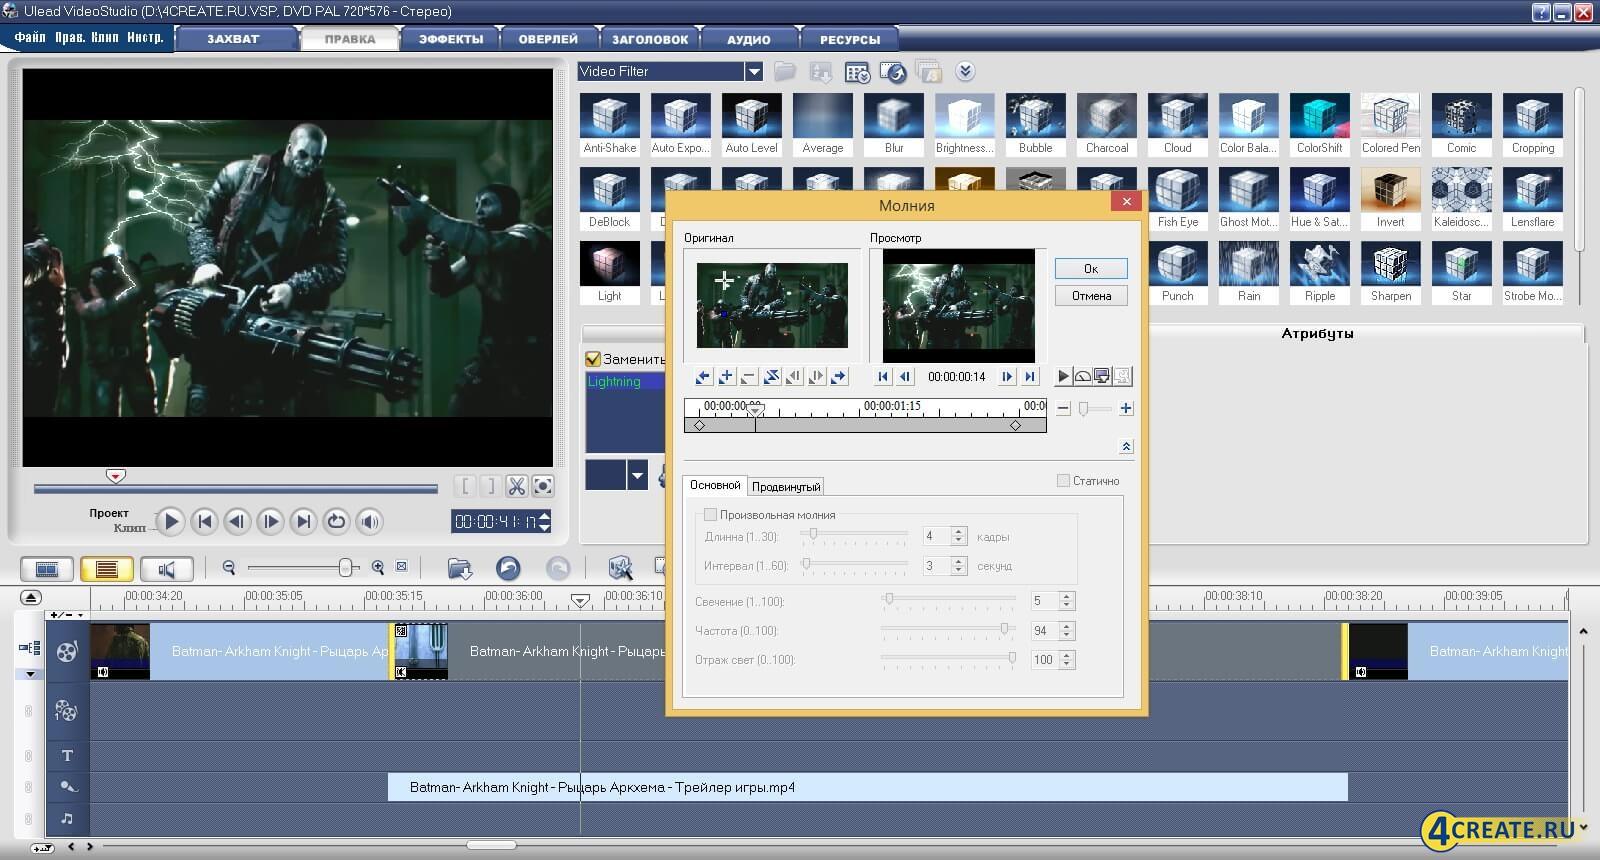 Ulead VideoStudio 11.5 (Скриншот 2)